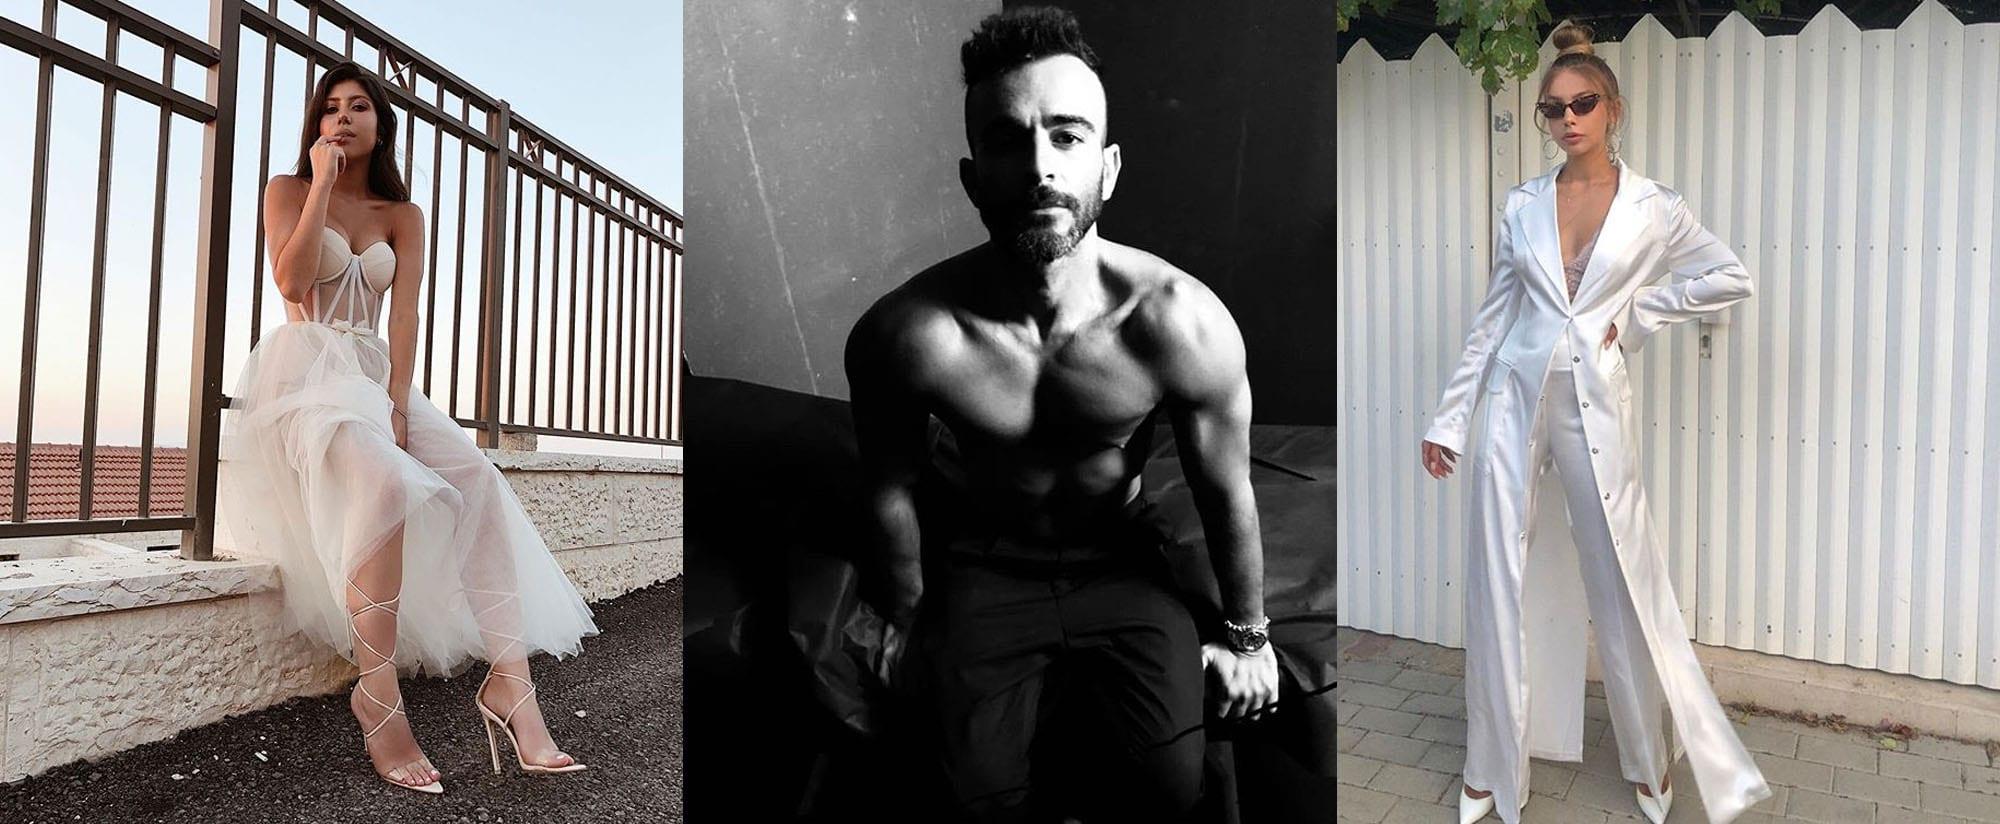 Fashion Israel, מגזין אופנה, אינסטגרם, אופנה, אירה אלבין, אליאב אוזן